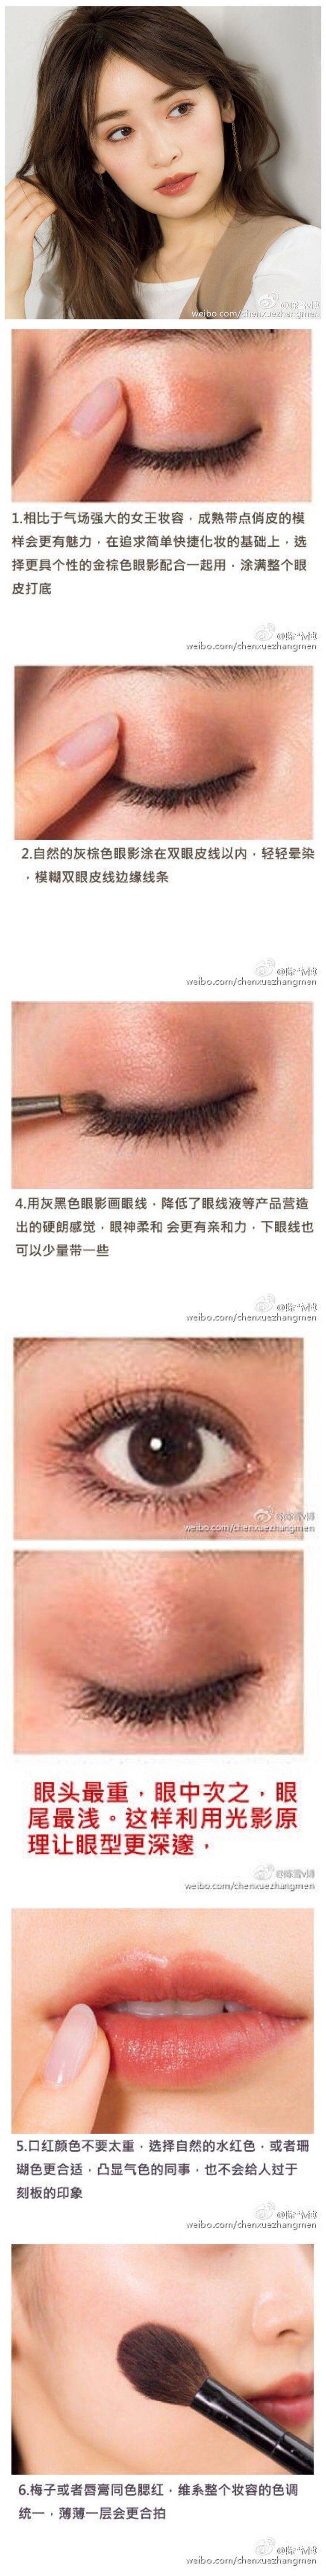 Hot eye makeup sex porn